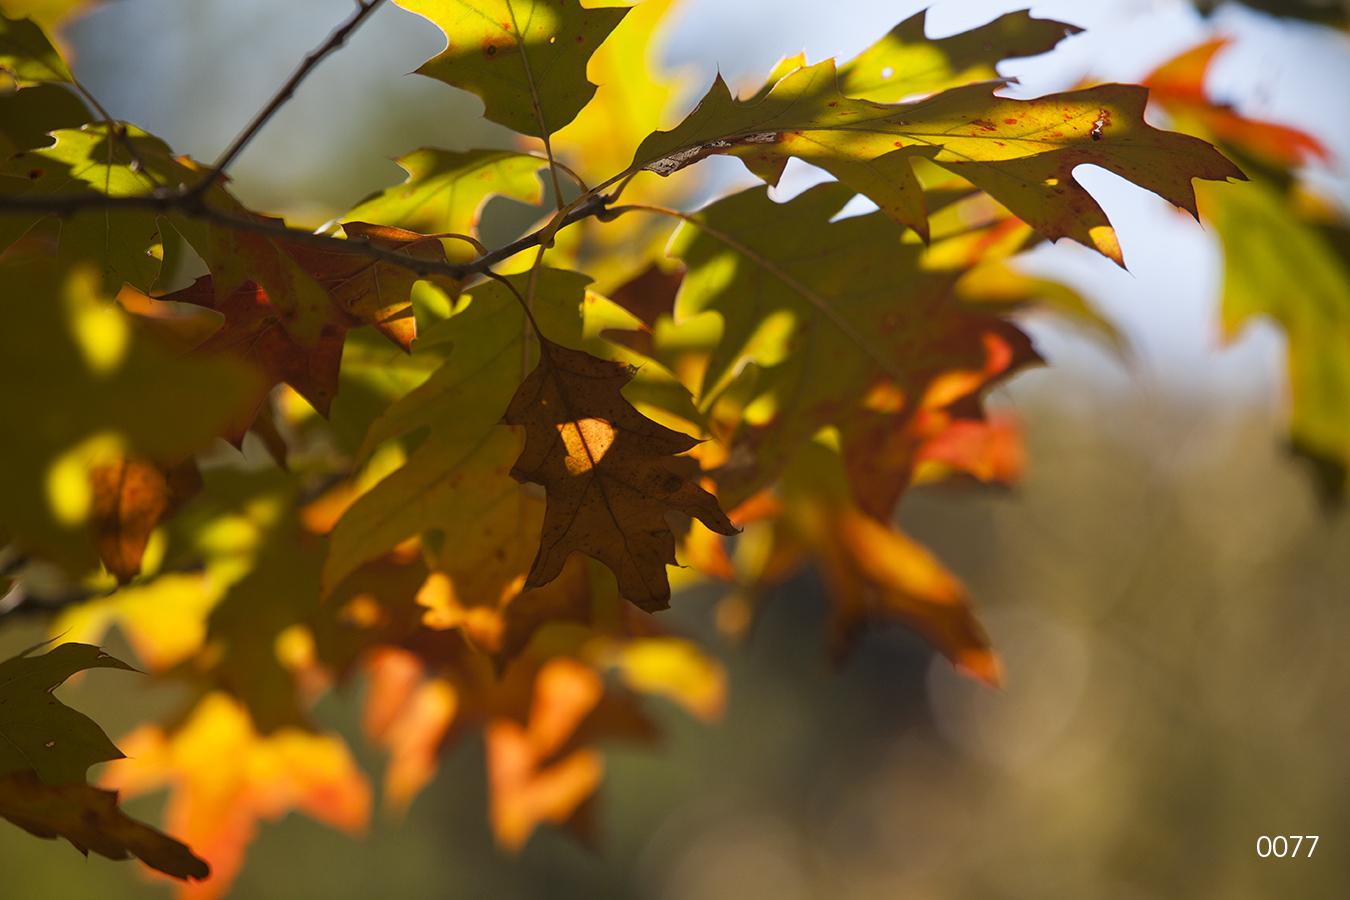 tree trees leaves green yellow orange fall autumn shadows